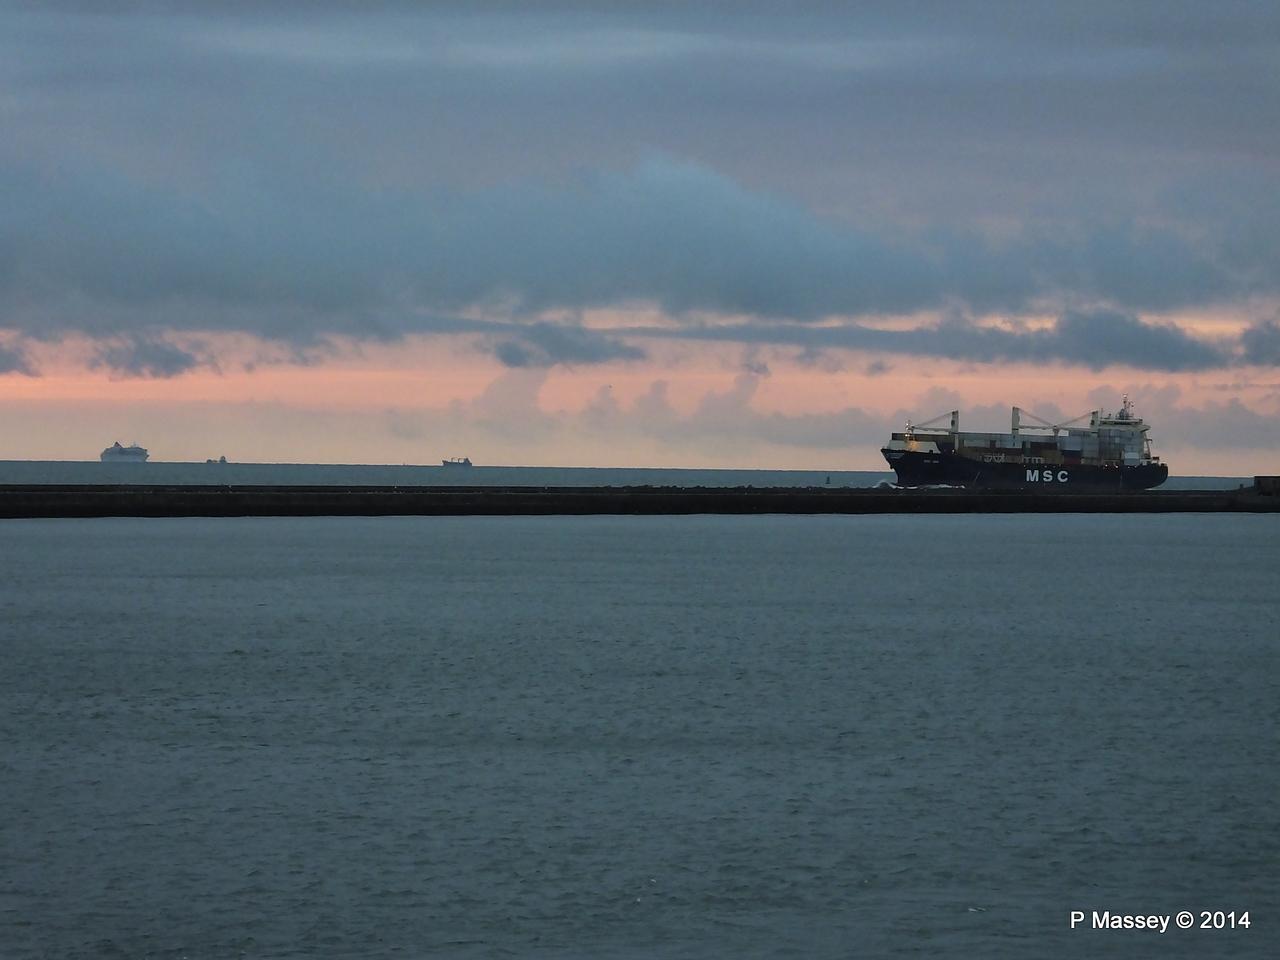 MSC UMA Inbound Le Havre BALMORAL from Rouen PDM 06-10-2014 18-24-46